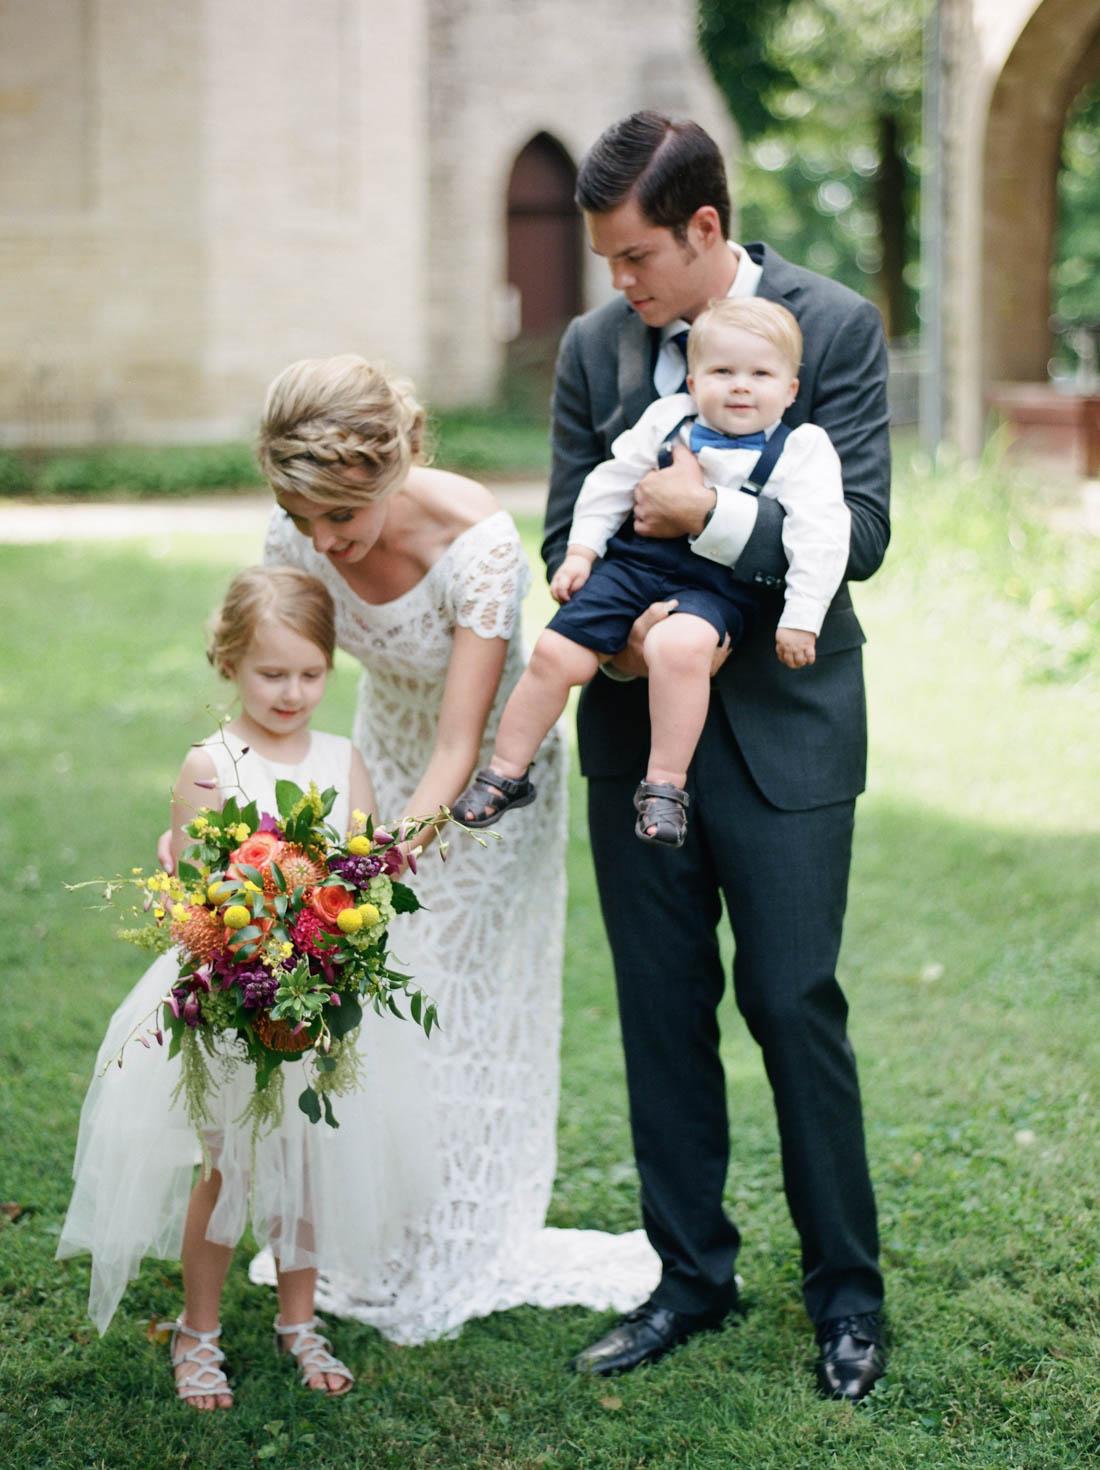 kateweinsteinphoto_katieluke_wedding-325.jpg